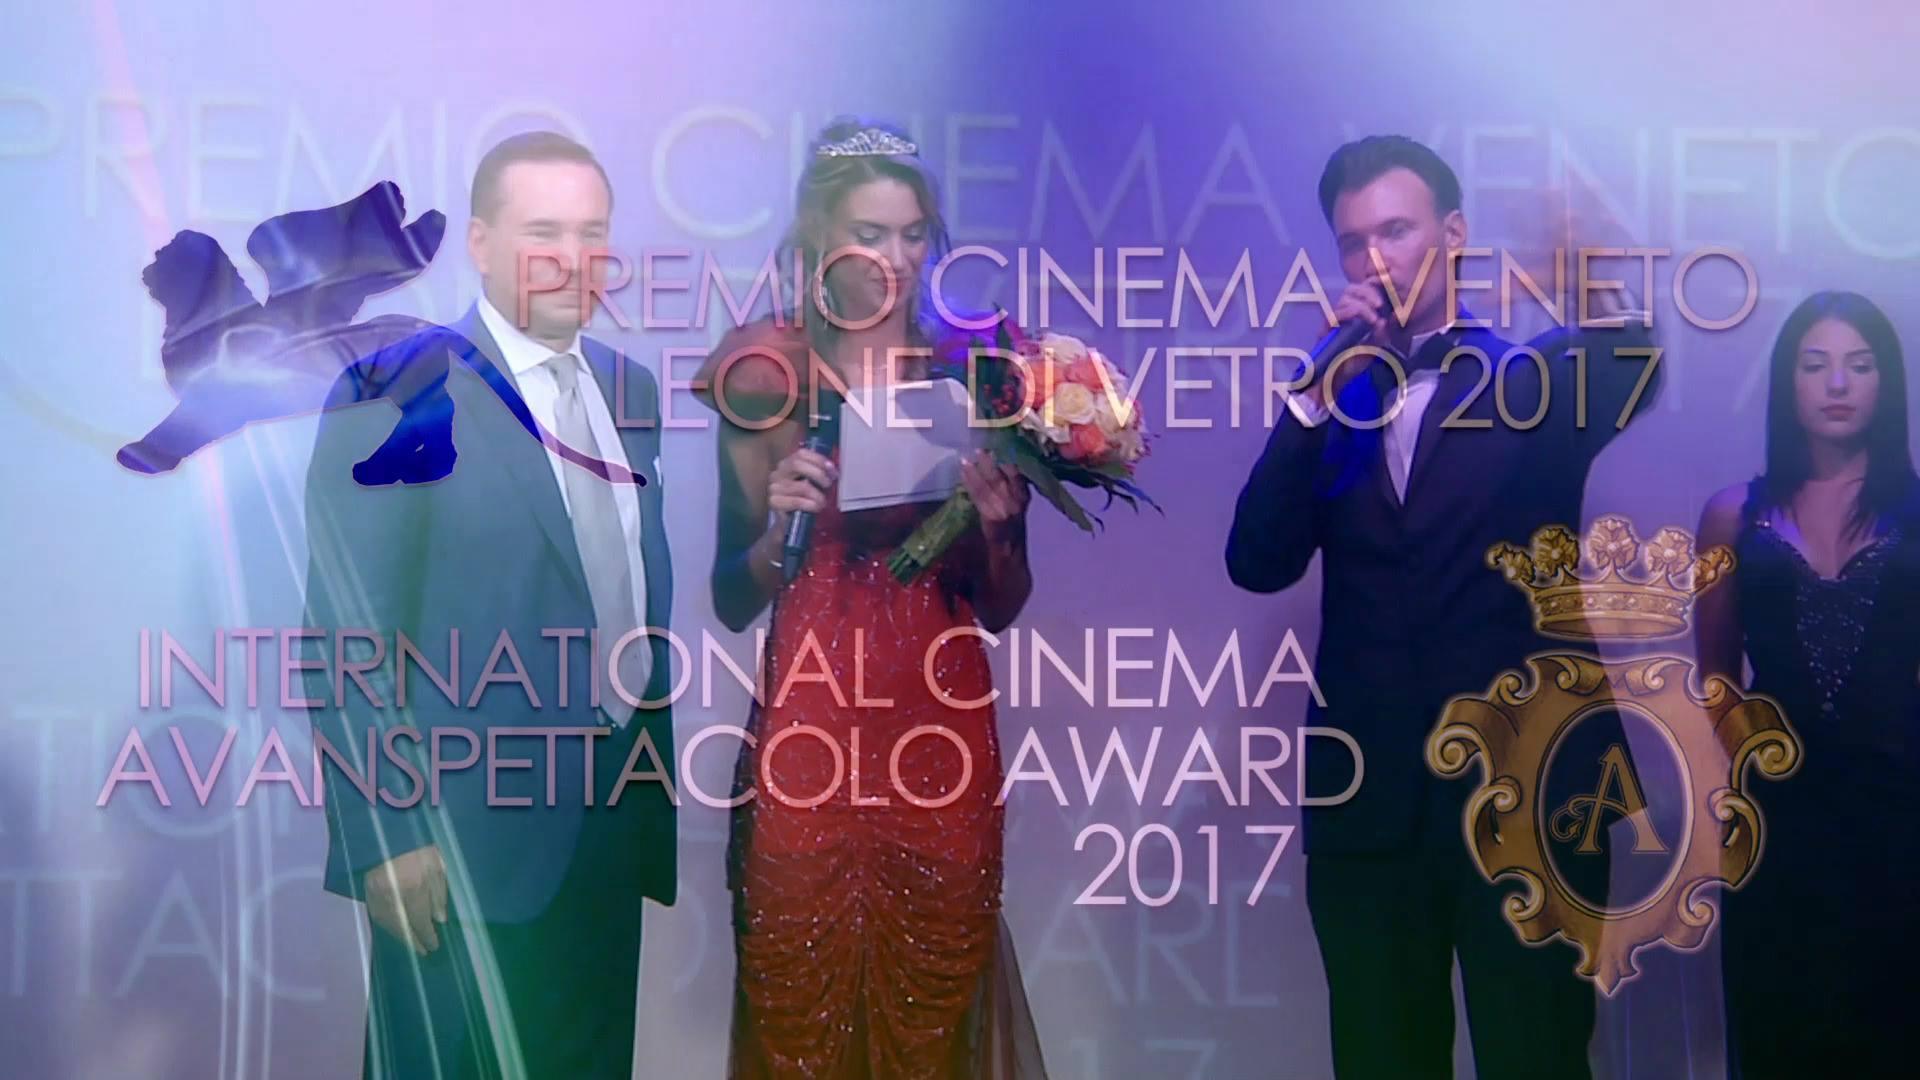 Vittoria Tomasi presenta: PREMIO CINEMA VENETO LEONE DI VETRO & INTERNATIONAL CINE...